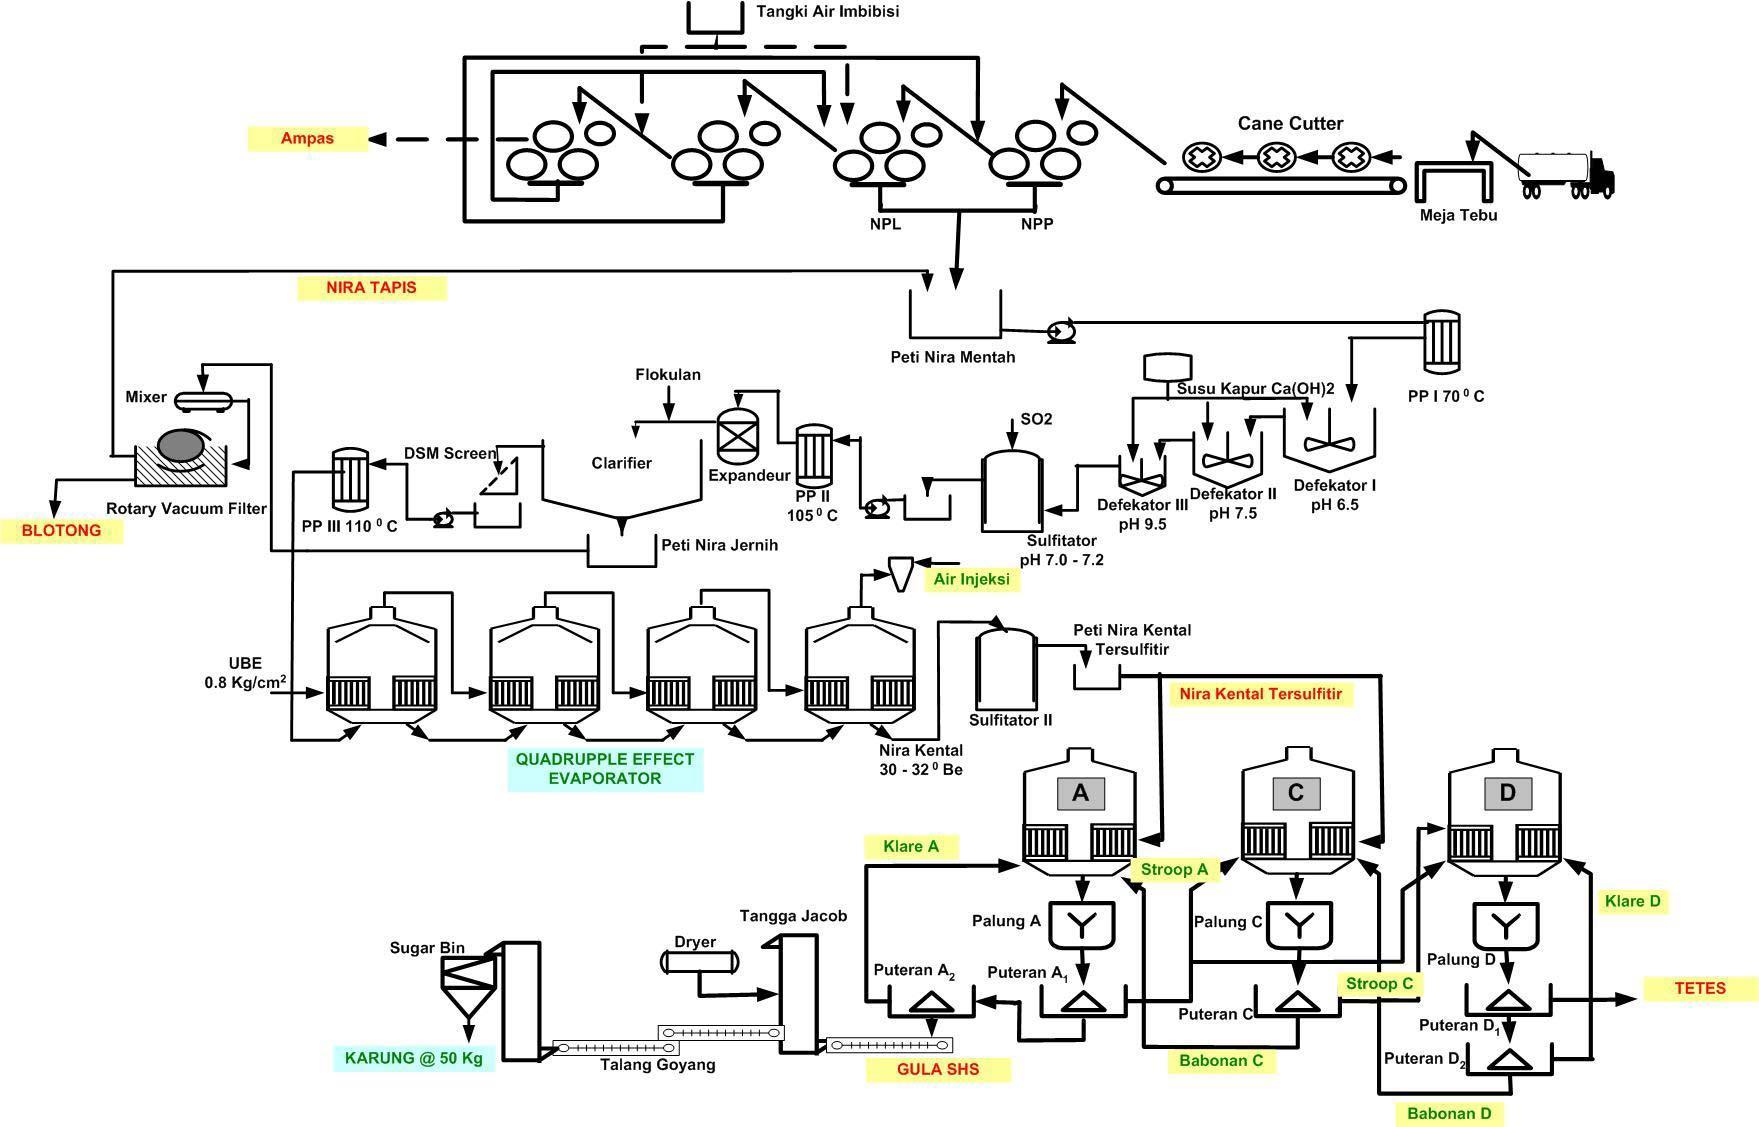 Makalah Proses Pembuatan Gula Jamu Jamu